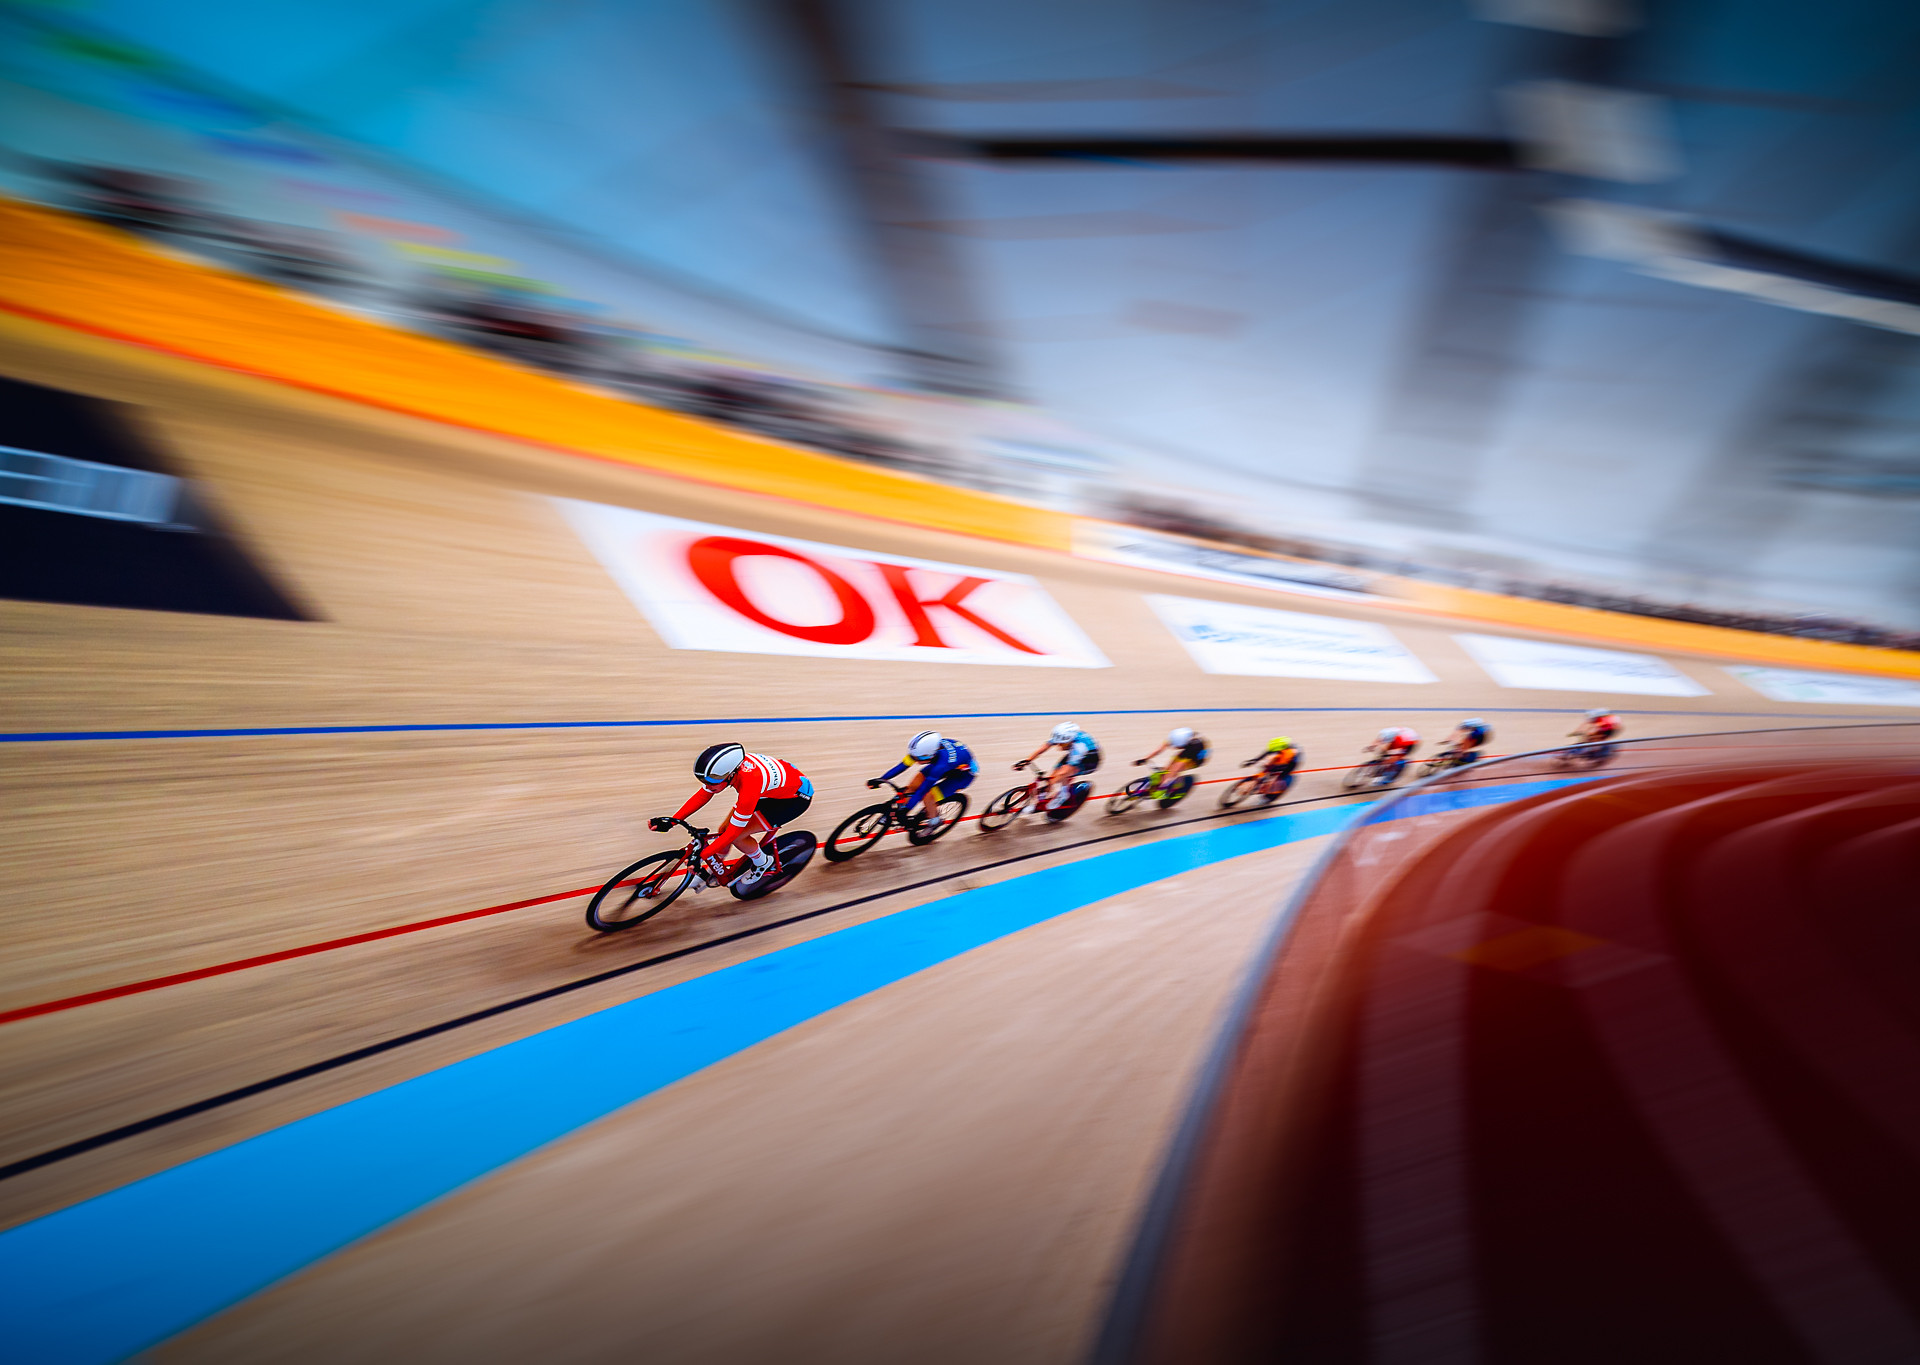 Grand Prix Odense 2019-3.jpg